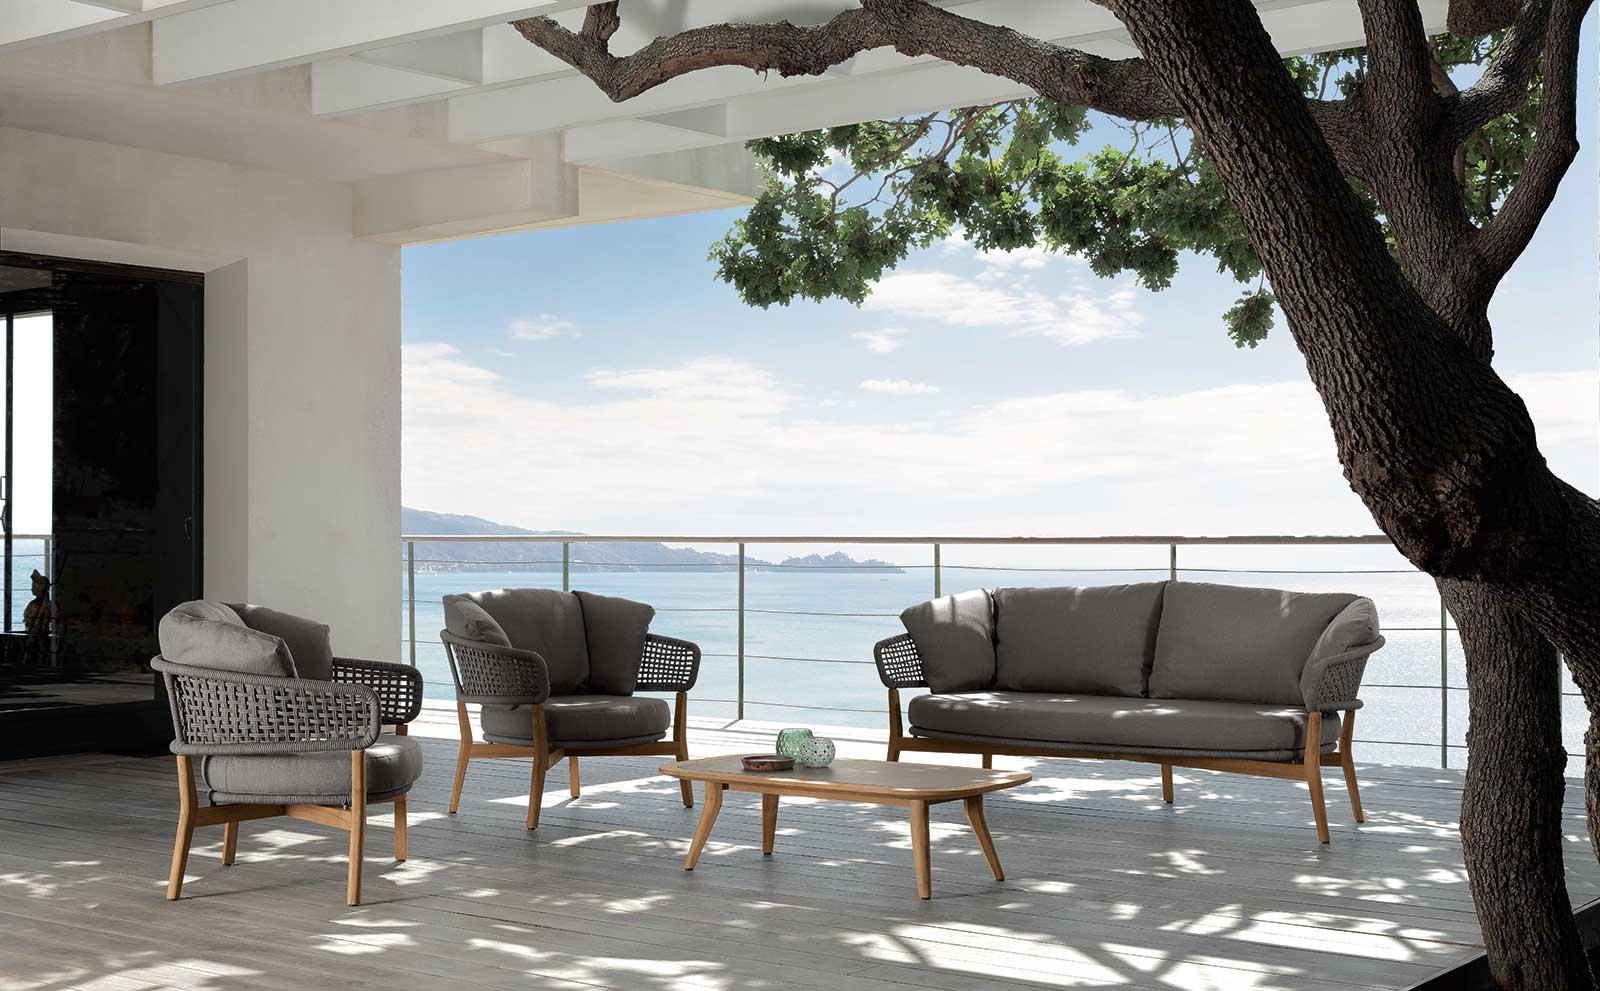 Lem salon de jardin en teak et aluminium